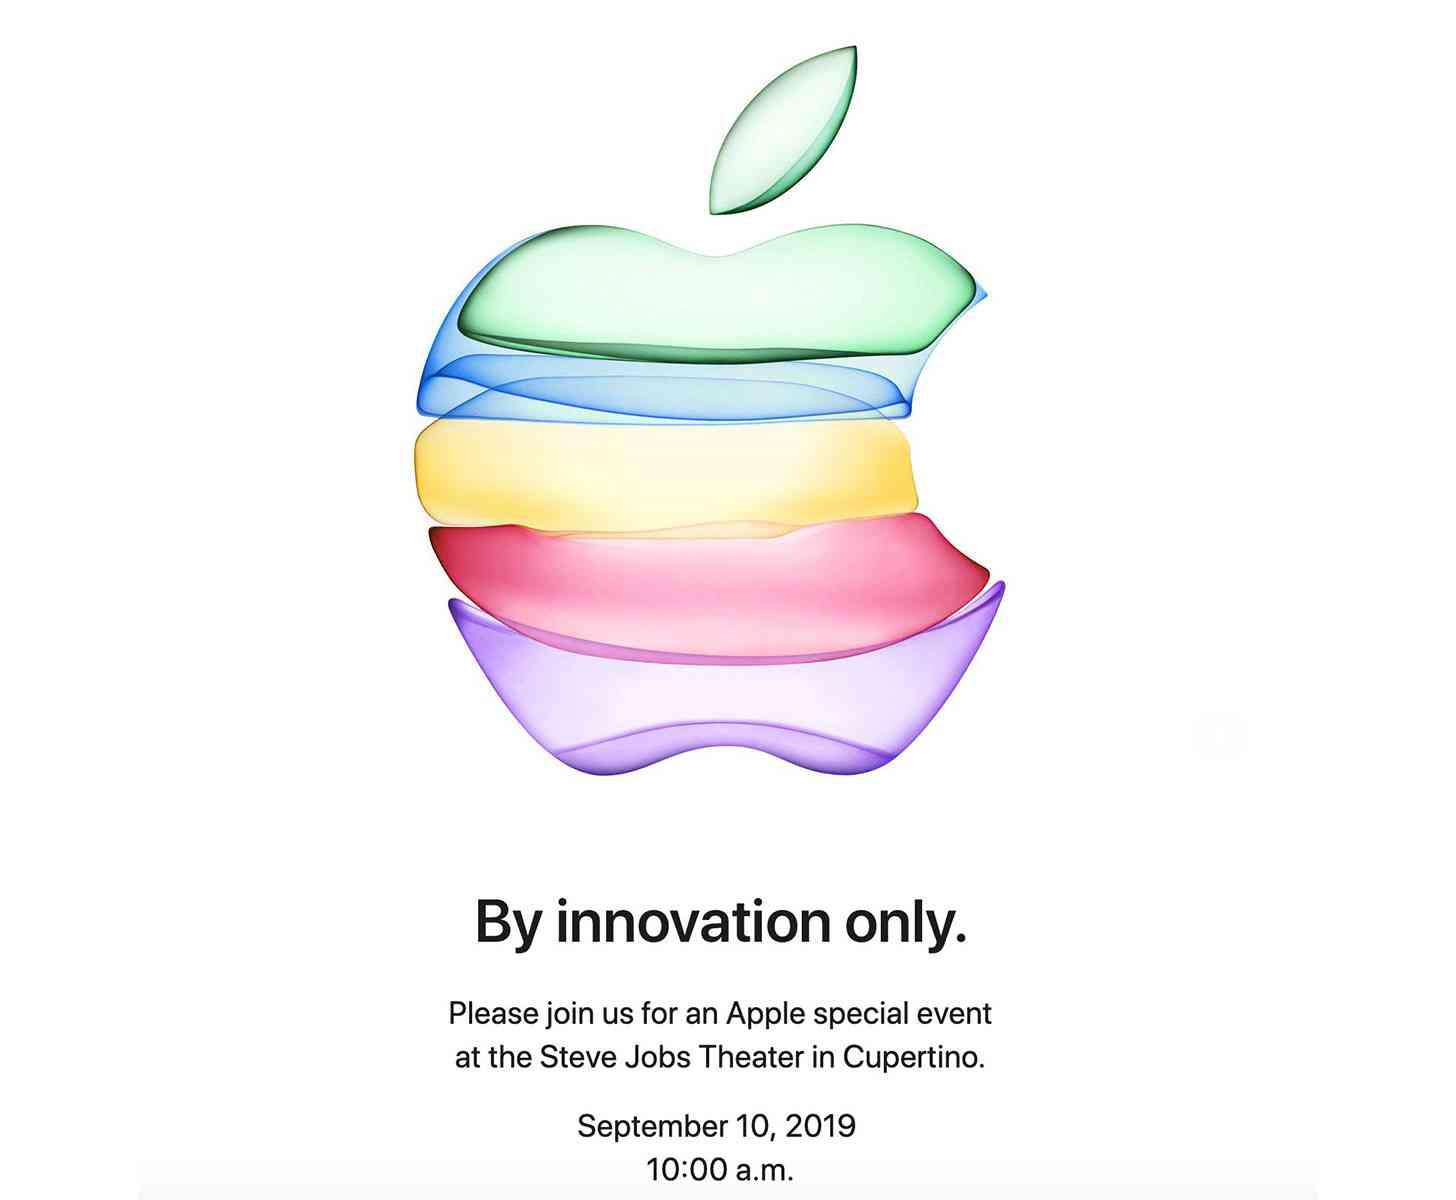 Apple iPhone 11 event invitation